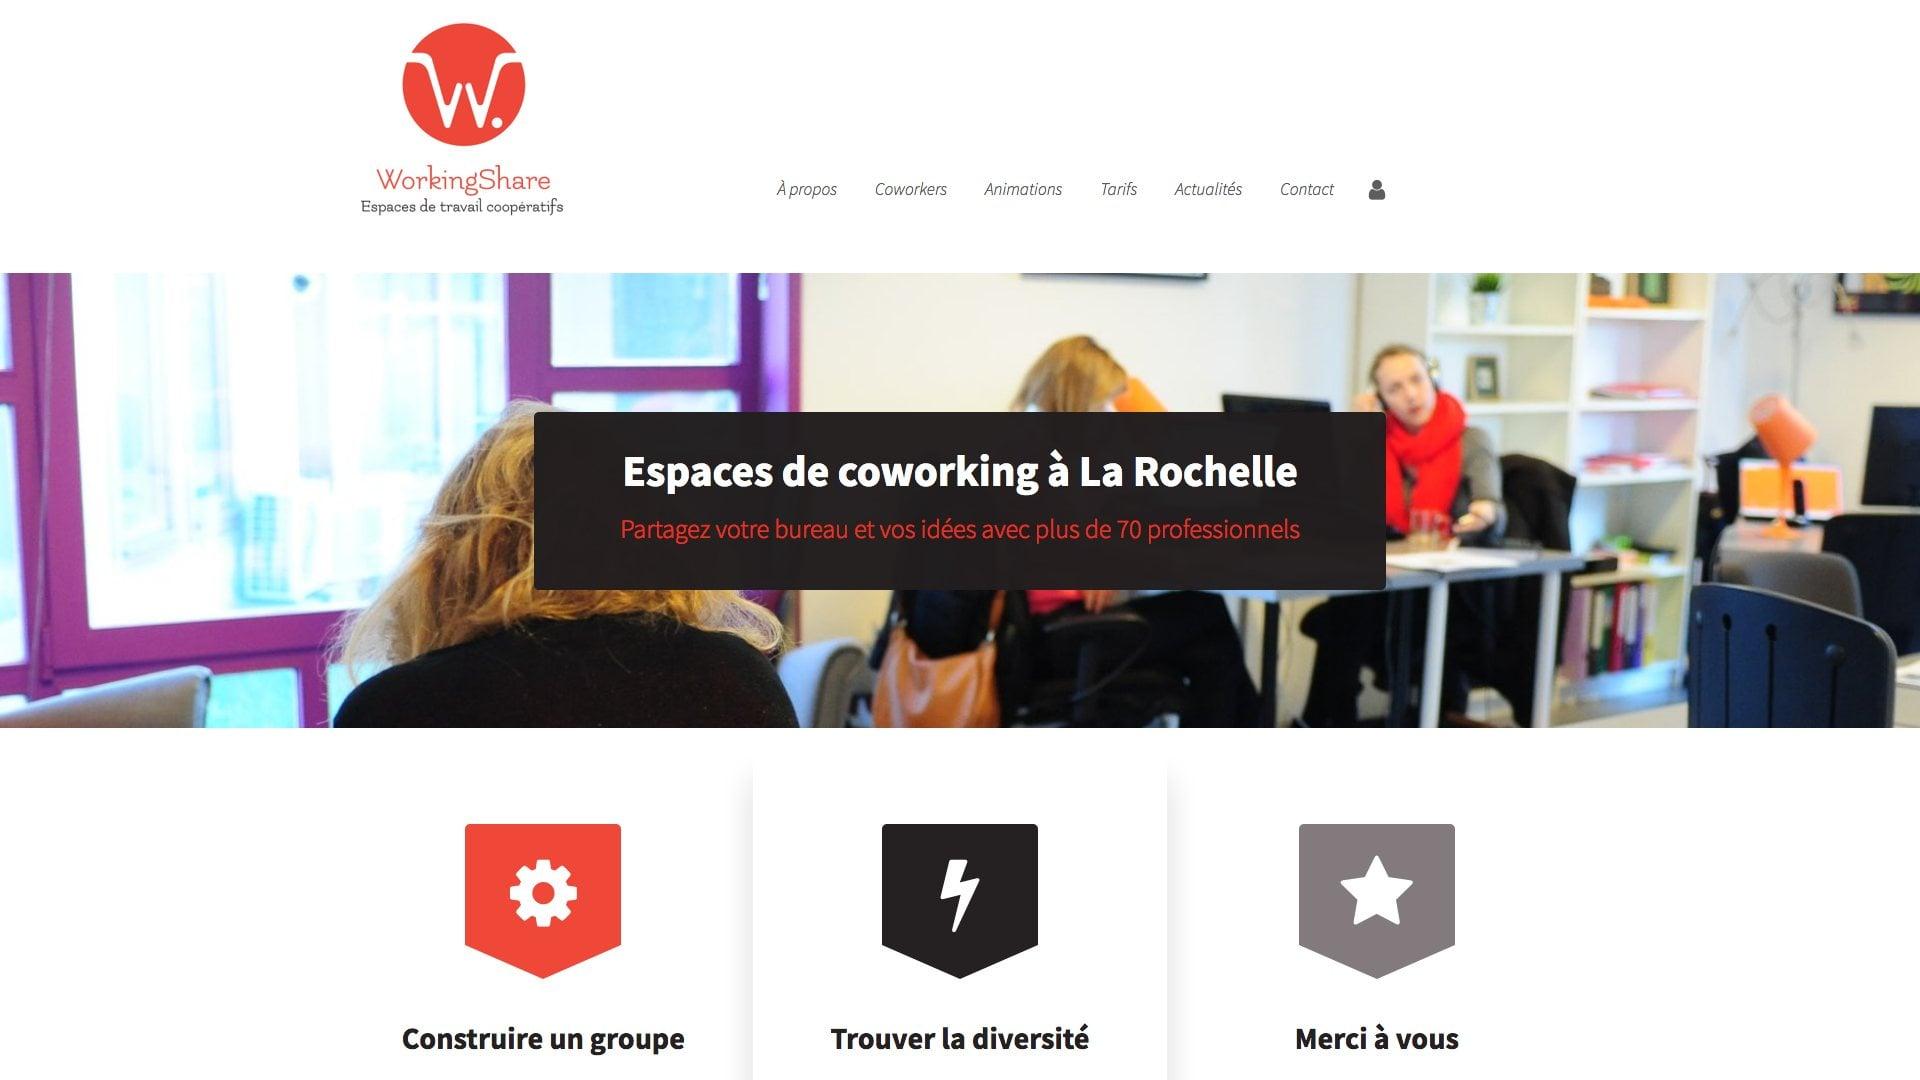 La rochelle Coworking - WorkingShare